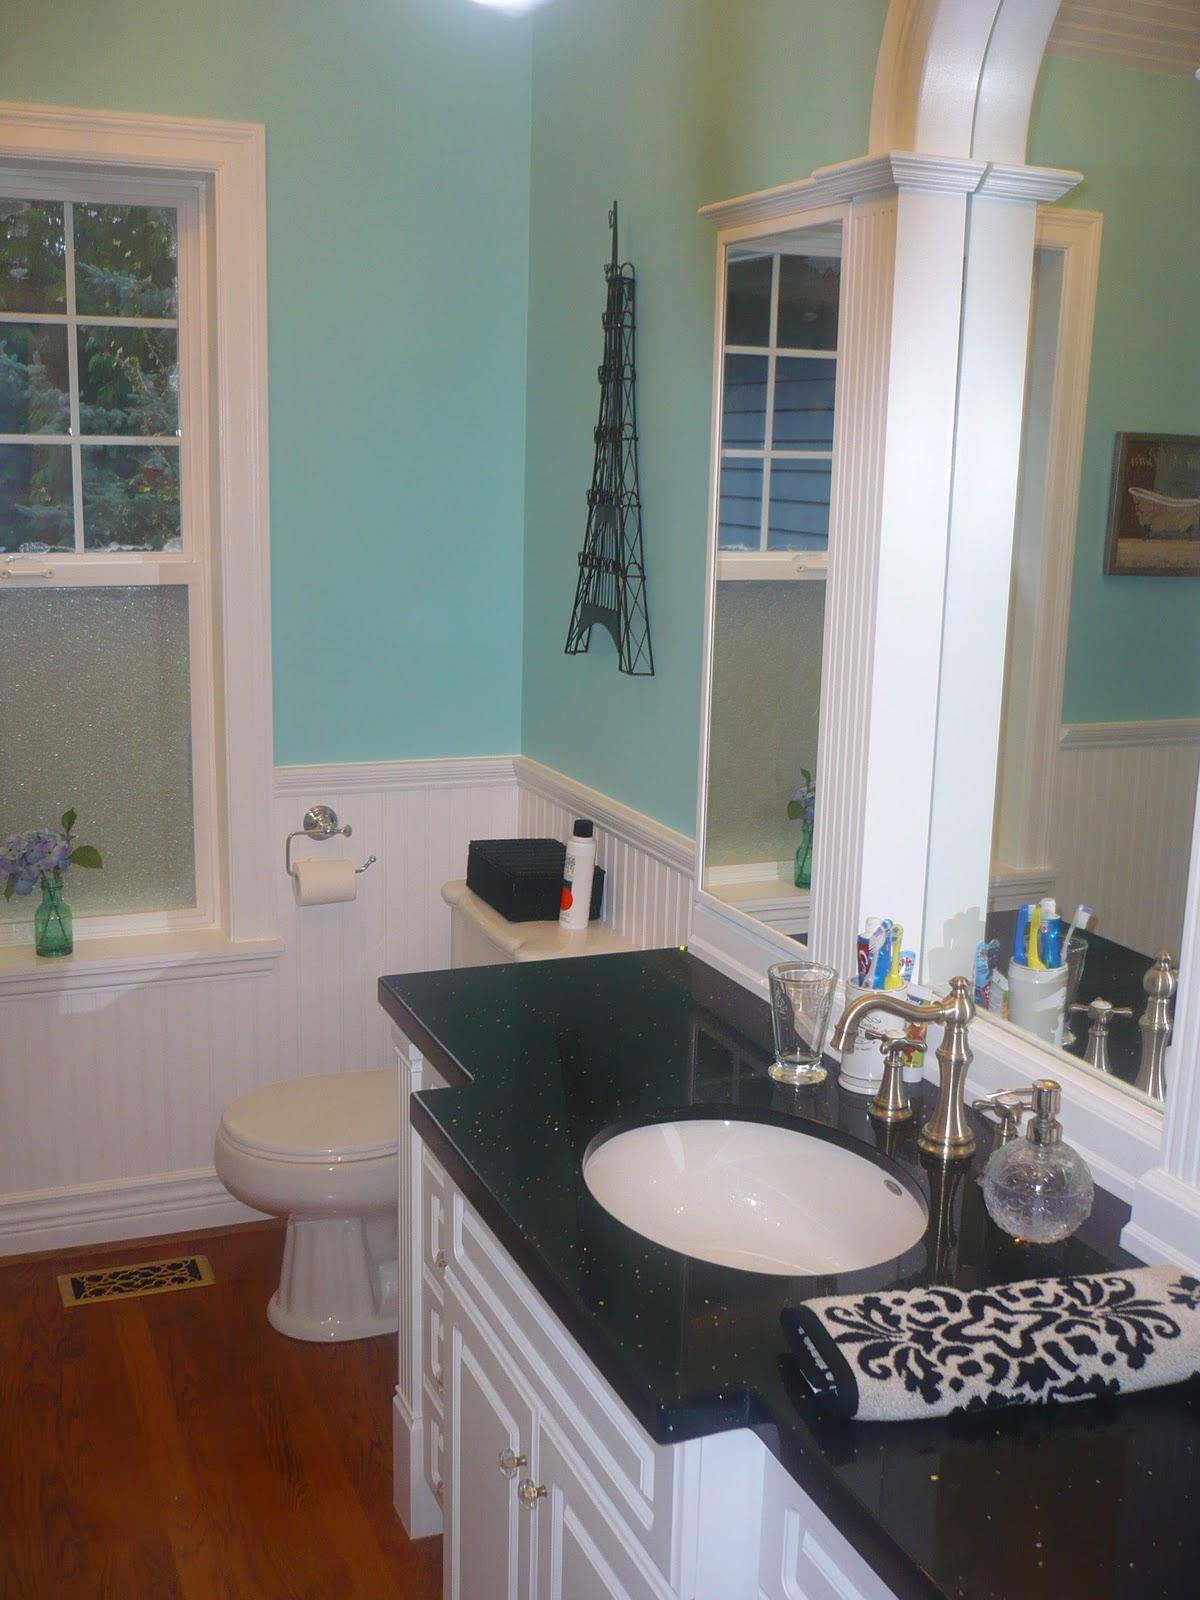 French Bathroom Sink Kayleas Corner Edge Of Your Seat Military Romantic Suspense